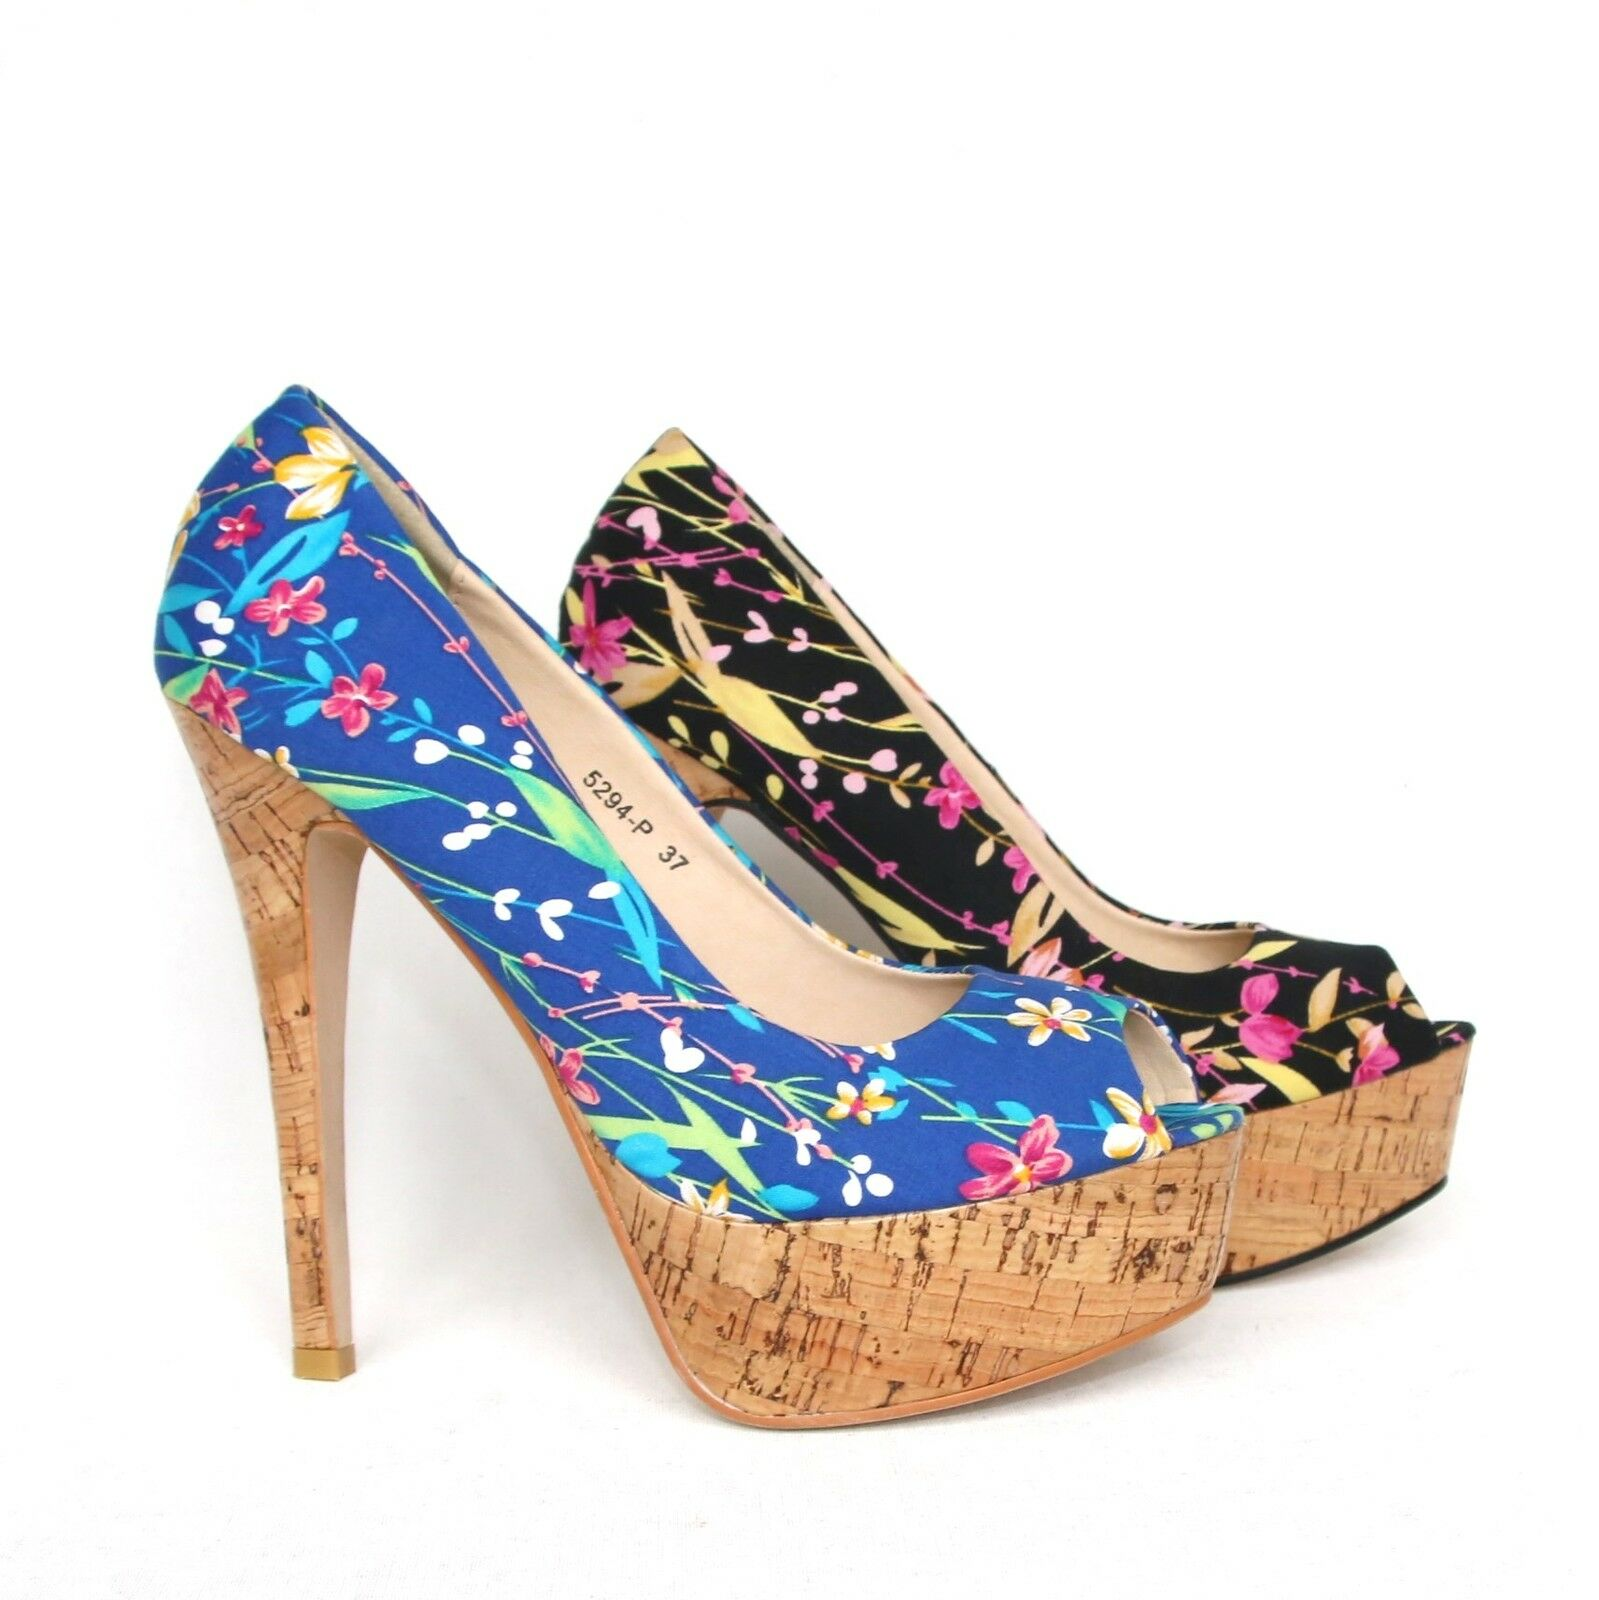 Damen Plateau High Heels Pumps Peeptoes Sandaletten Stilettos Shoes 5294-P